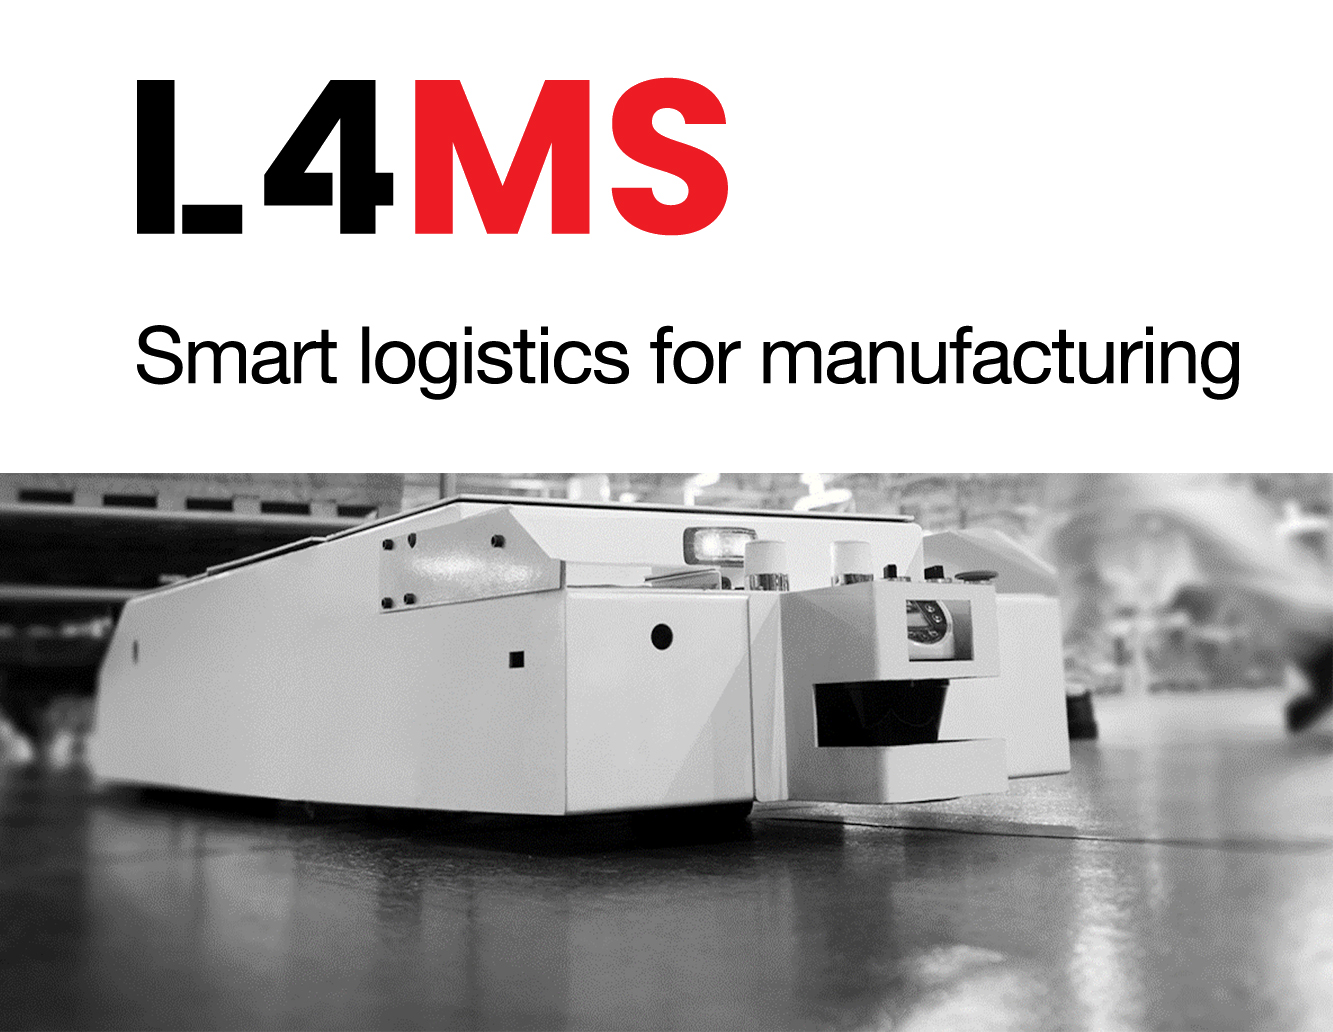 PoliMi-logistica-L4MS